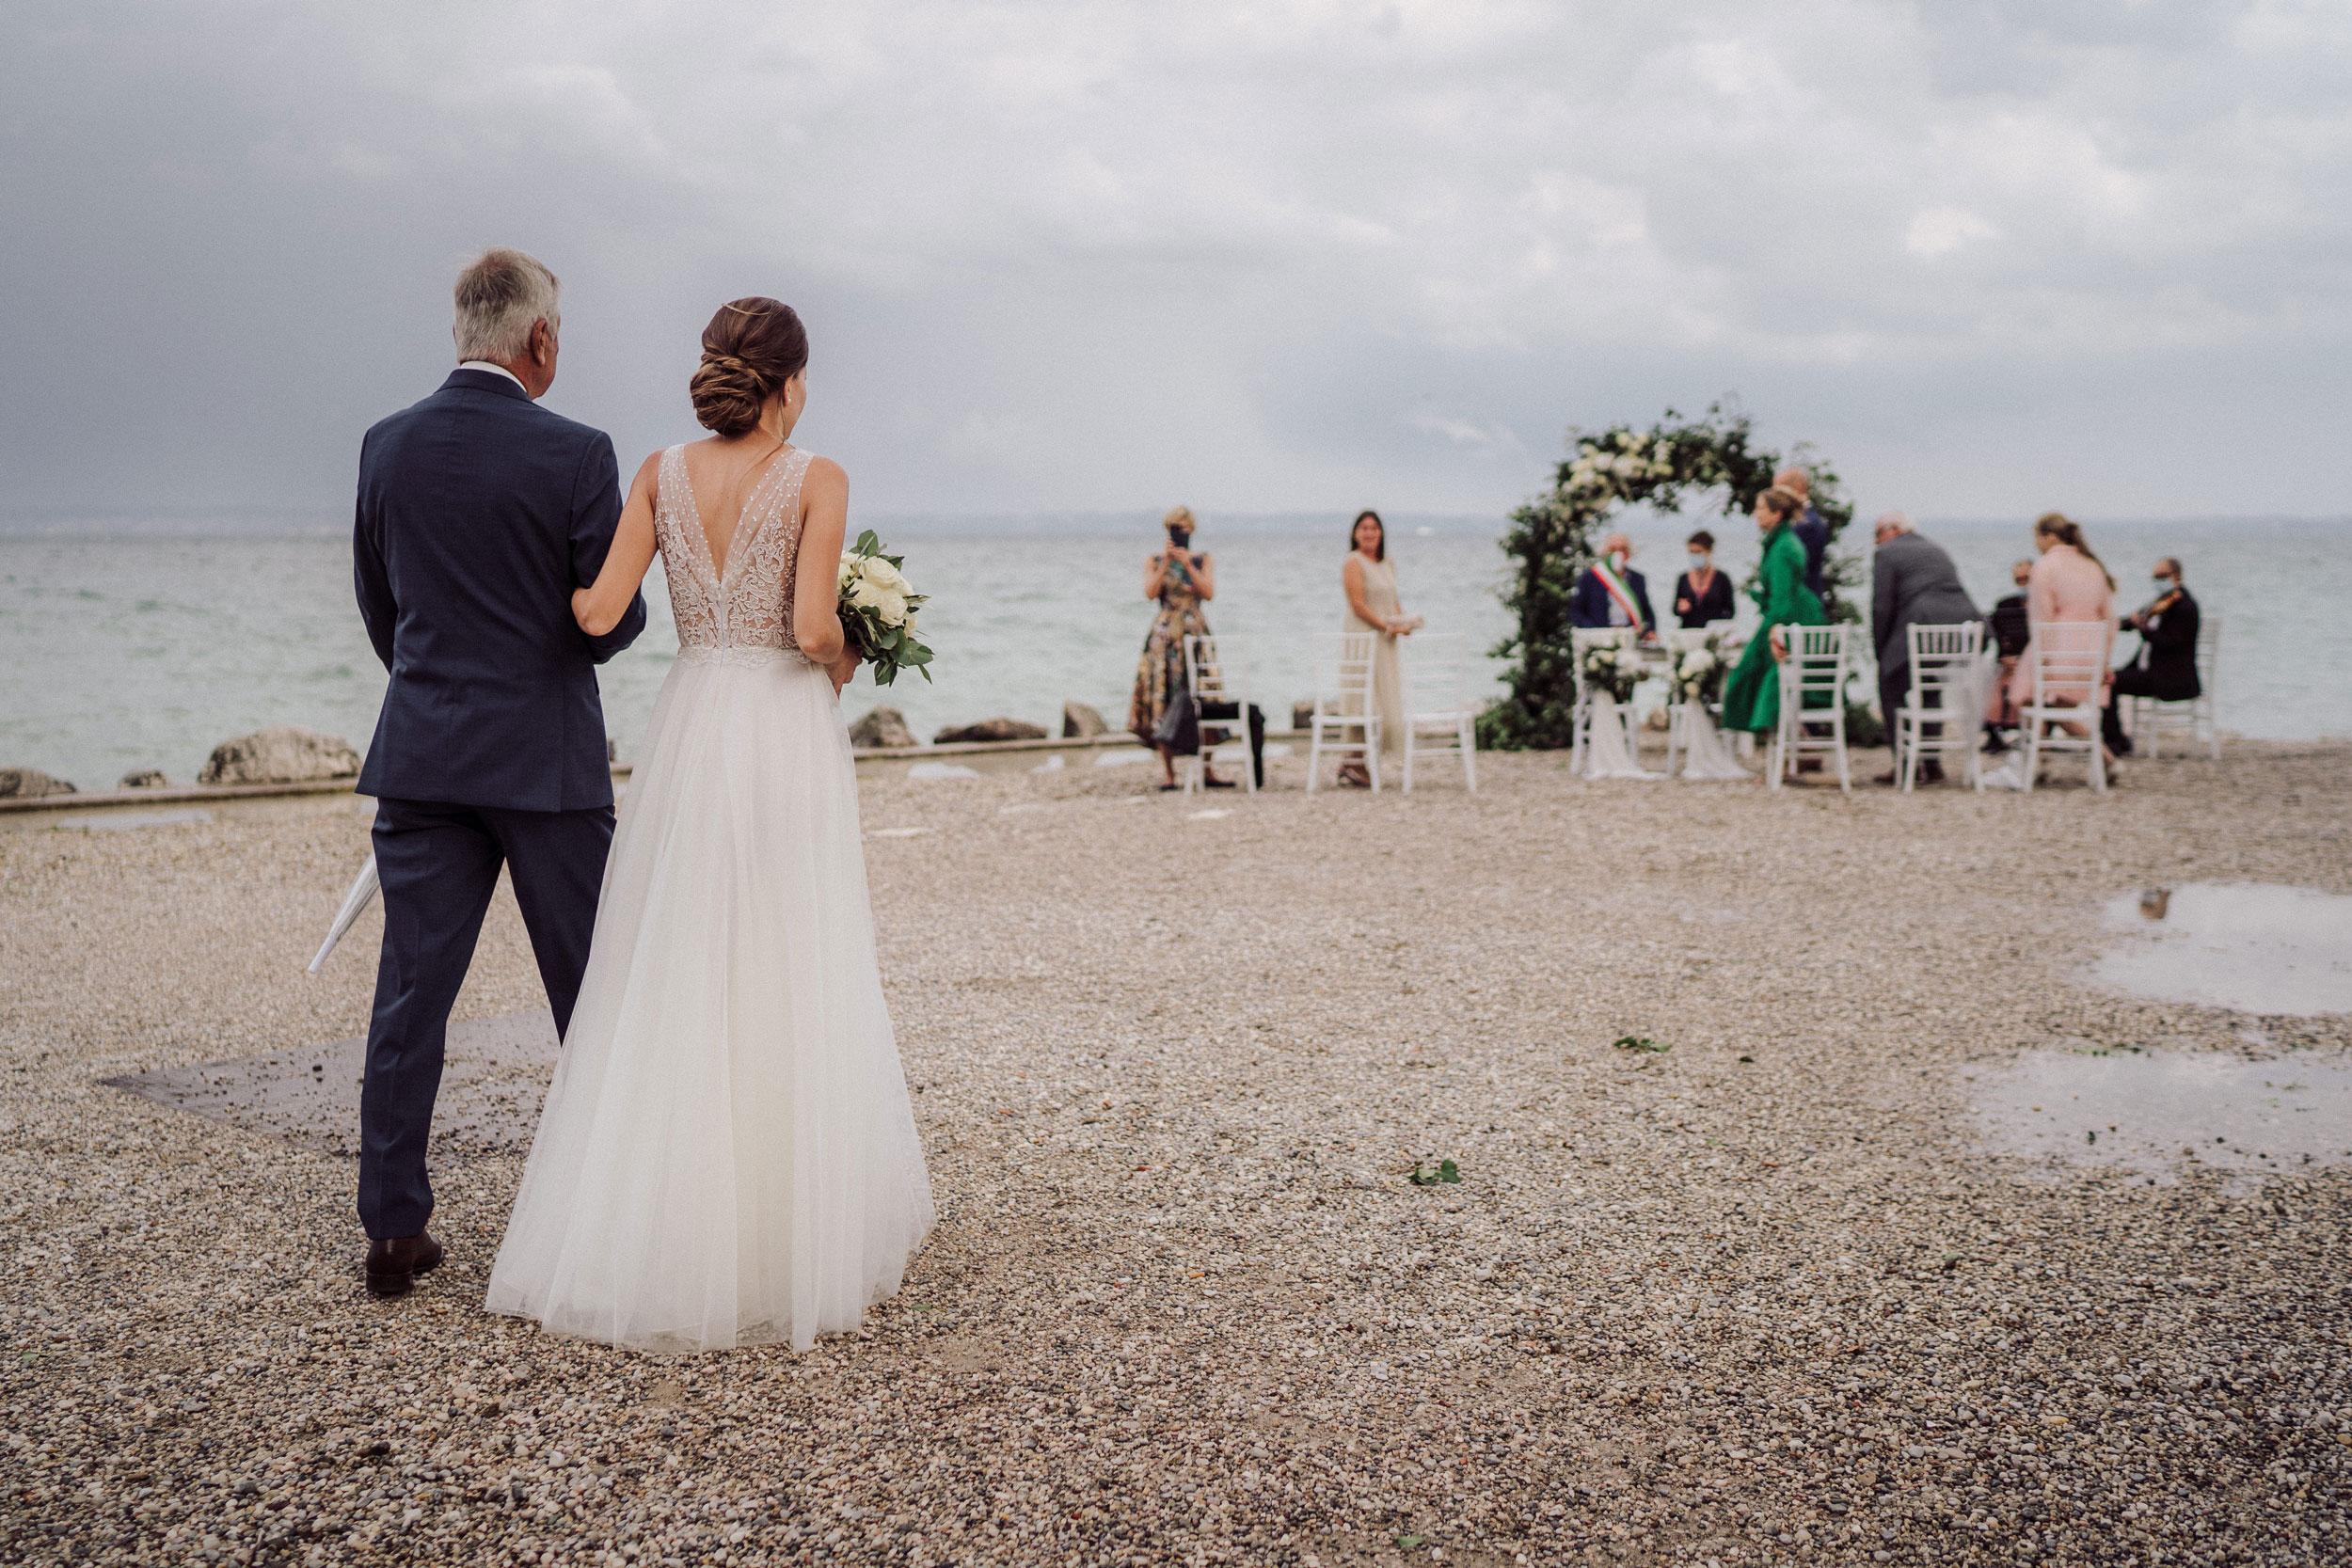 bridalhairandmakeup makeup Artist arlberg tyrol austria Lago di Garda Italy destination Wedding Melanie R.